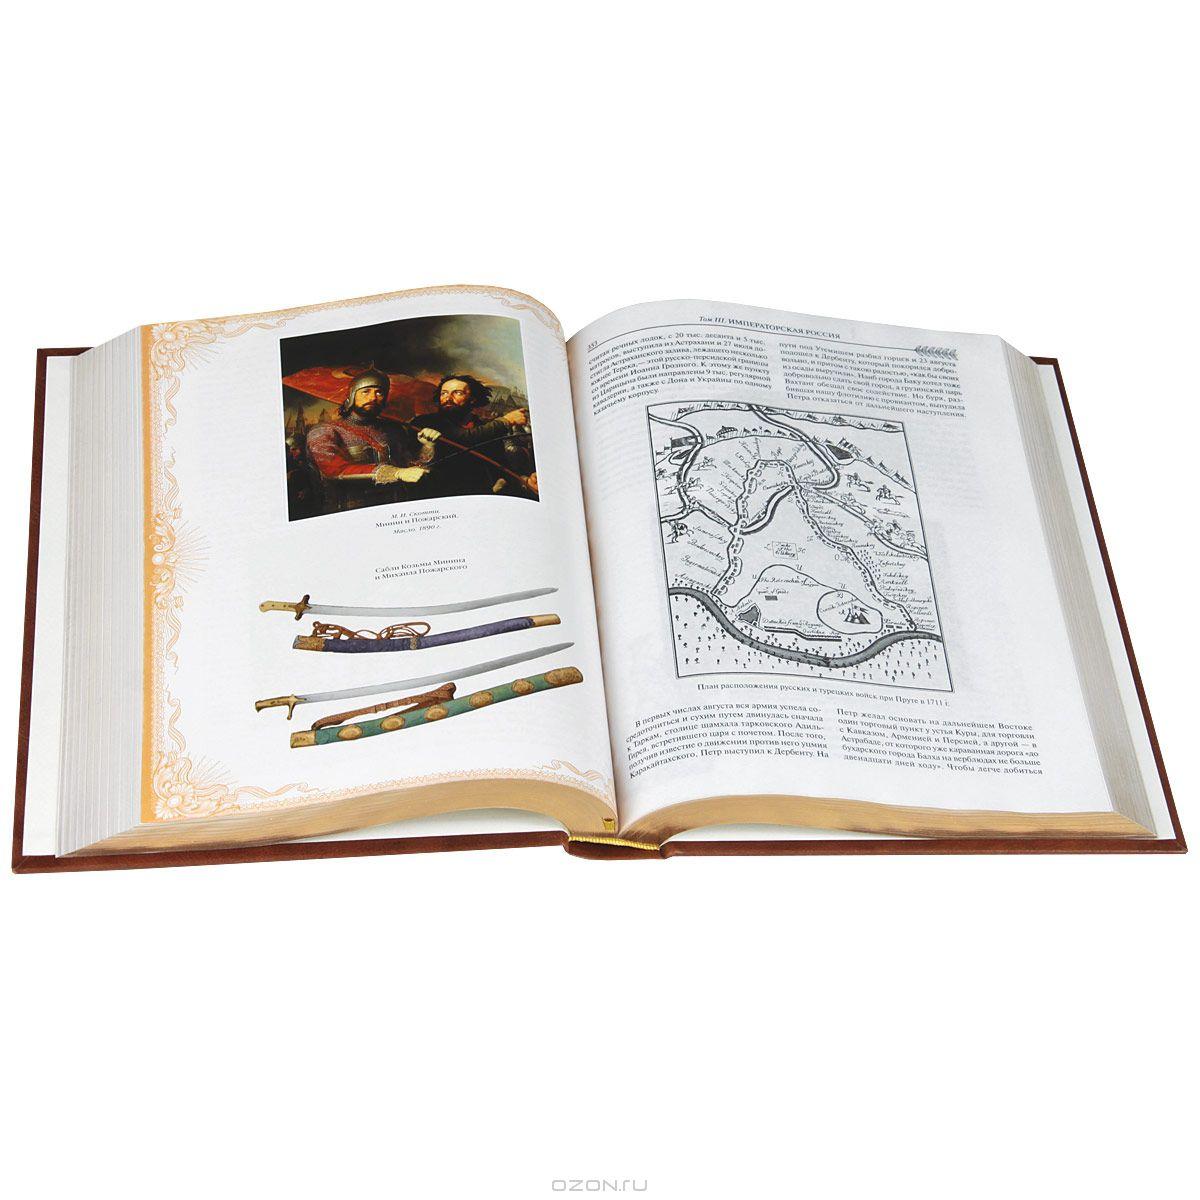 book ship construction fifth edition